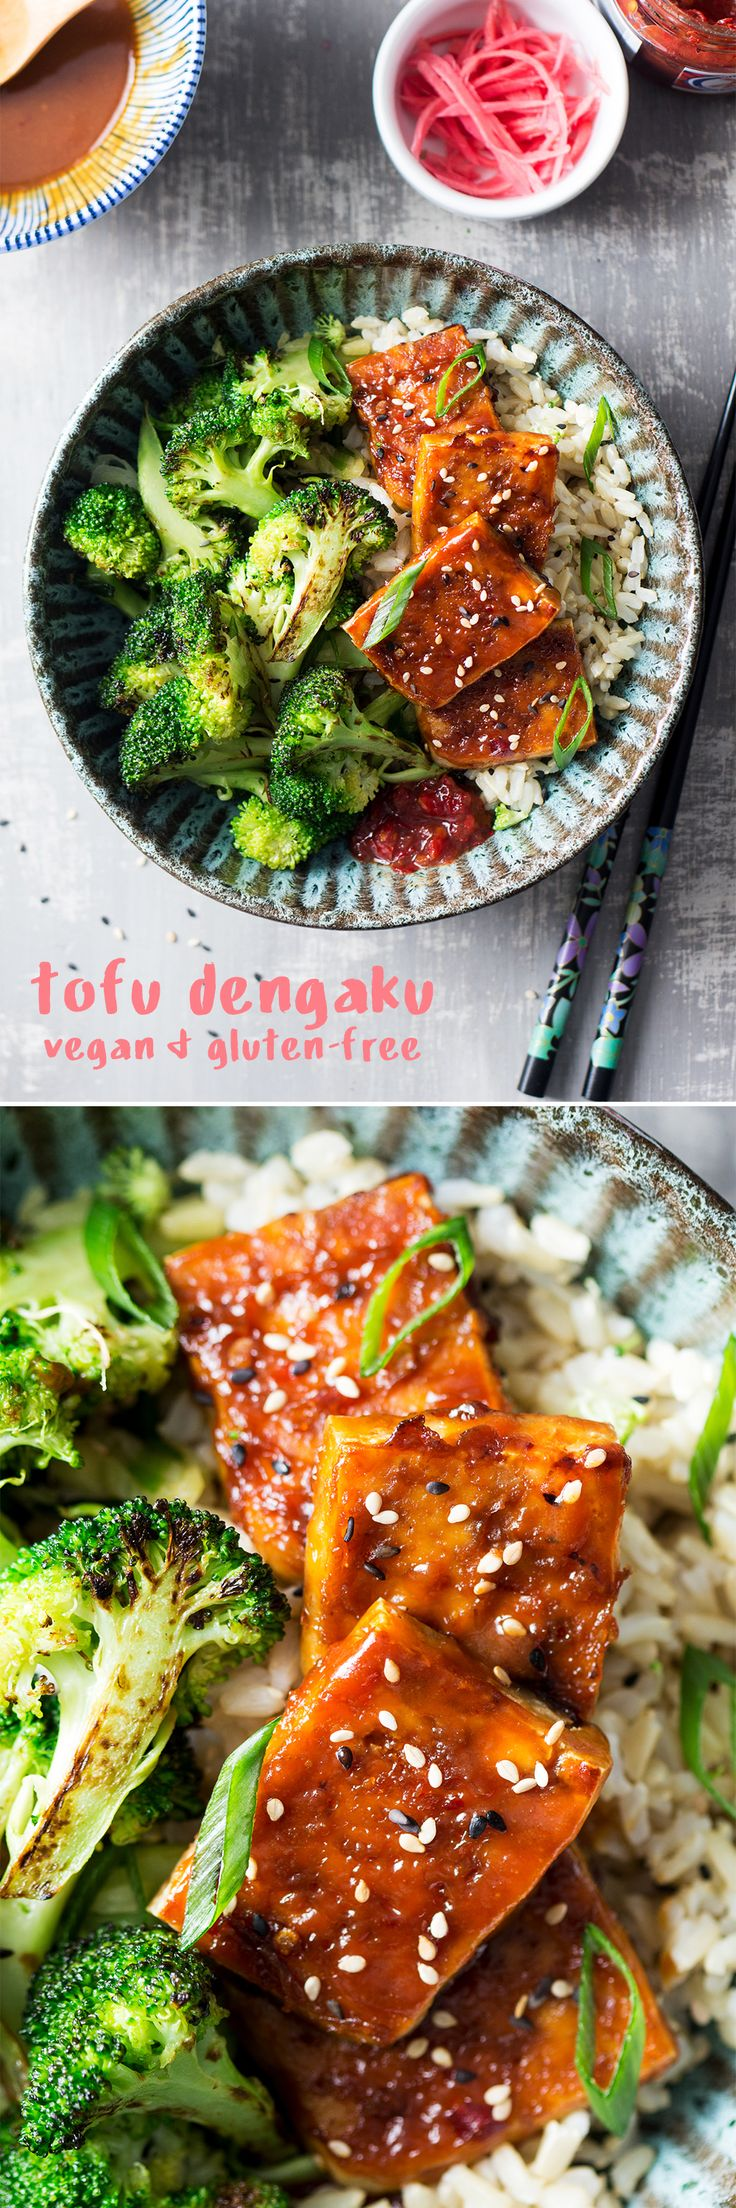 Tofu dengaku, miso glazed tofu  (vegan, GF)